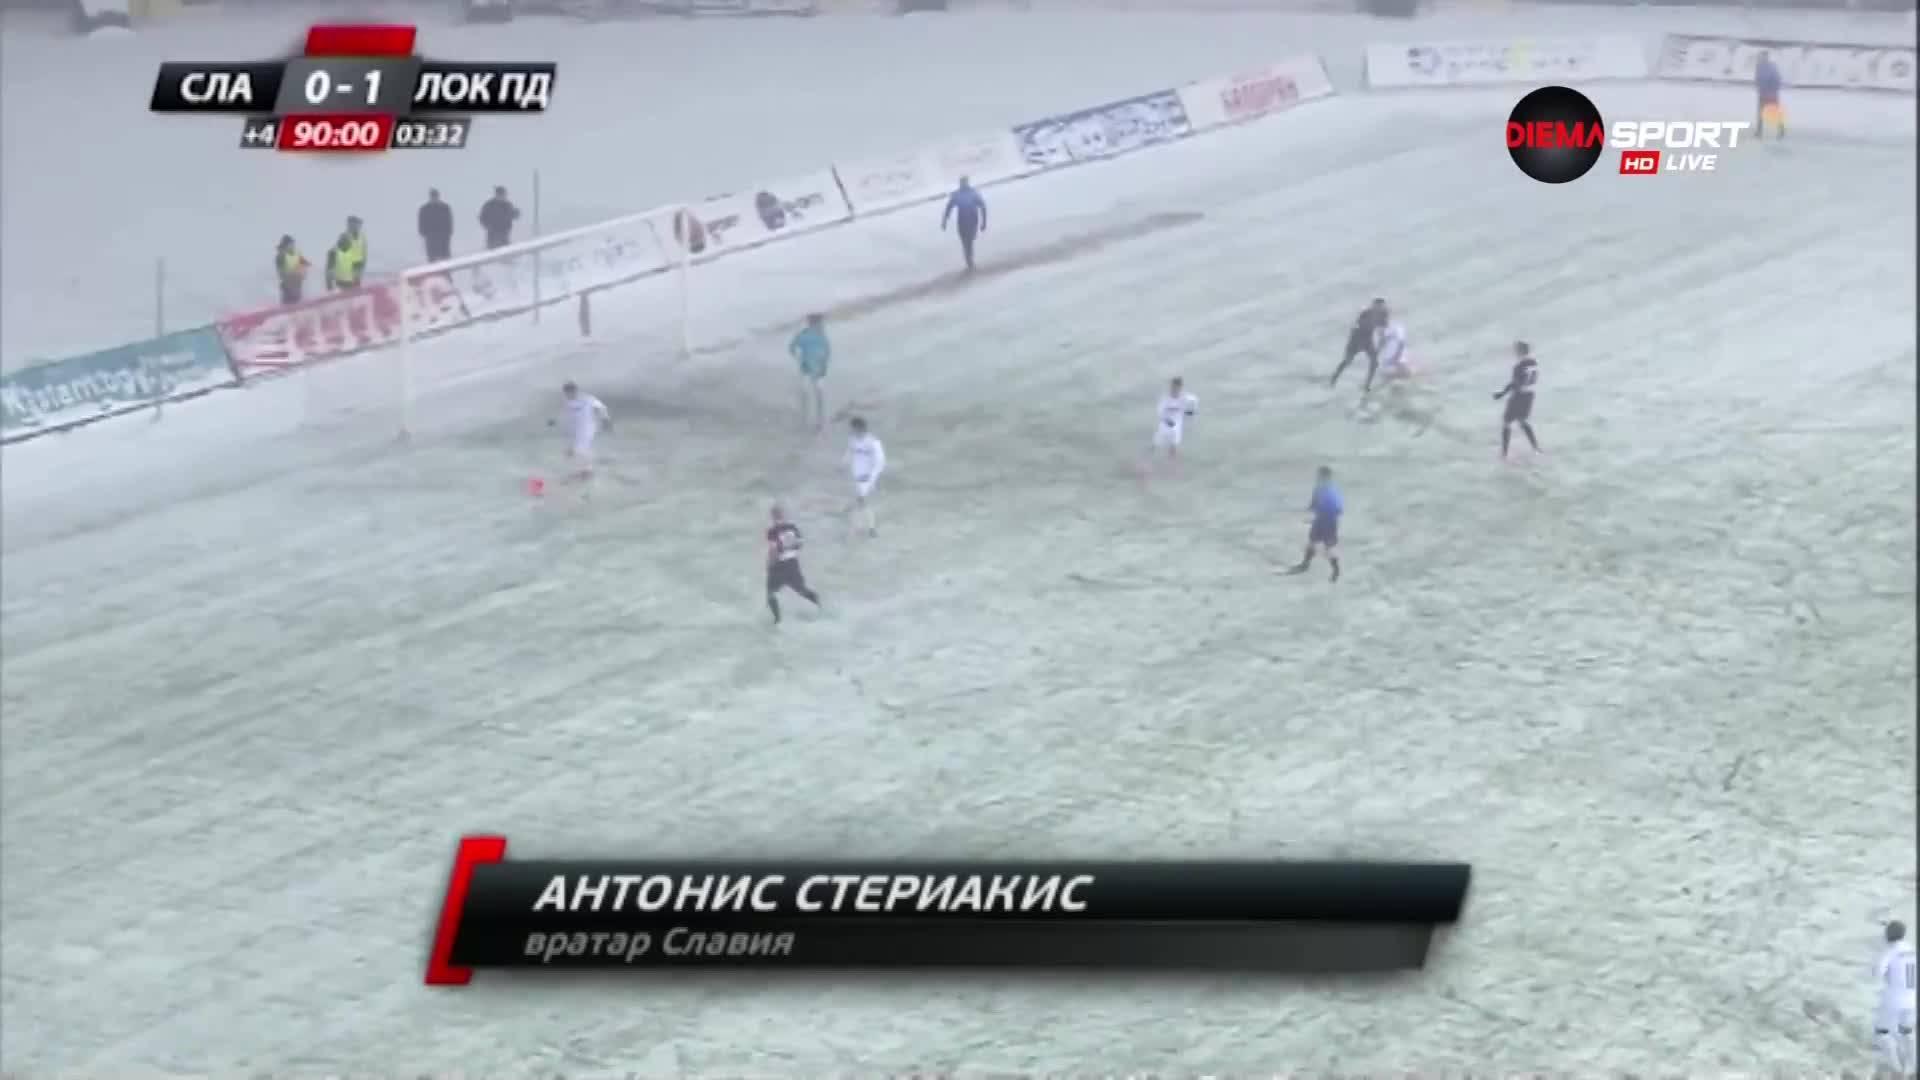 Спасяване на Антонис Стериакис срещу Локо Пд